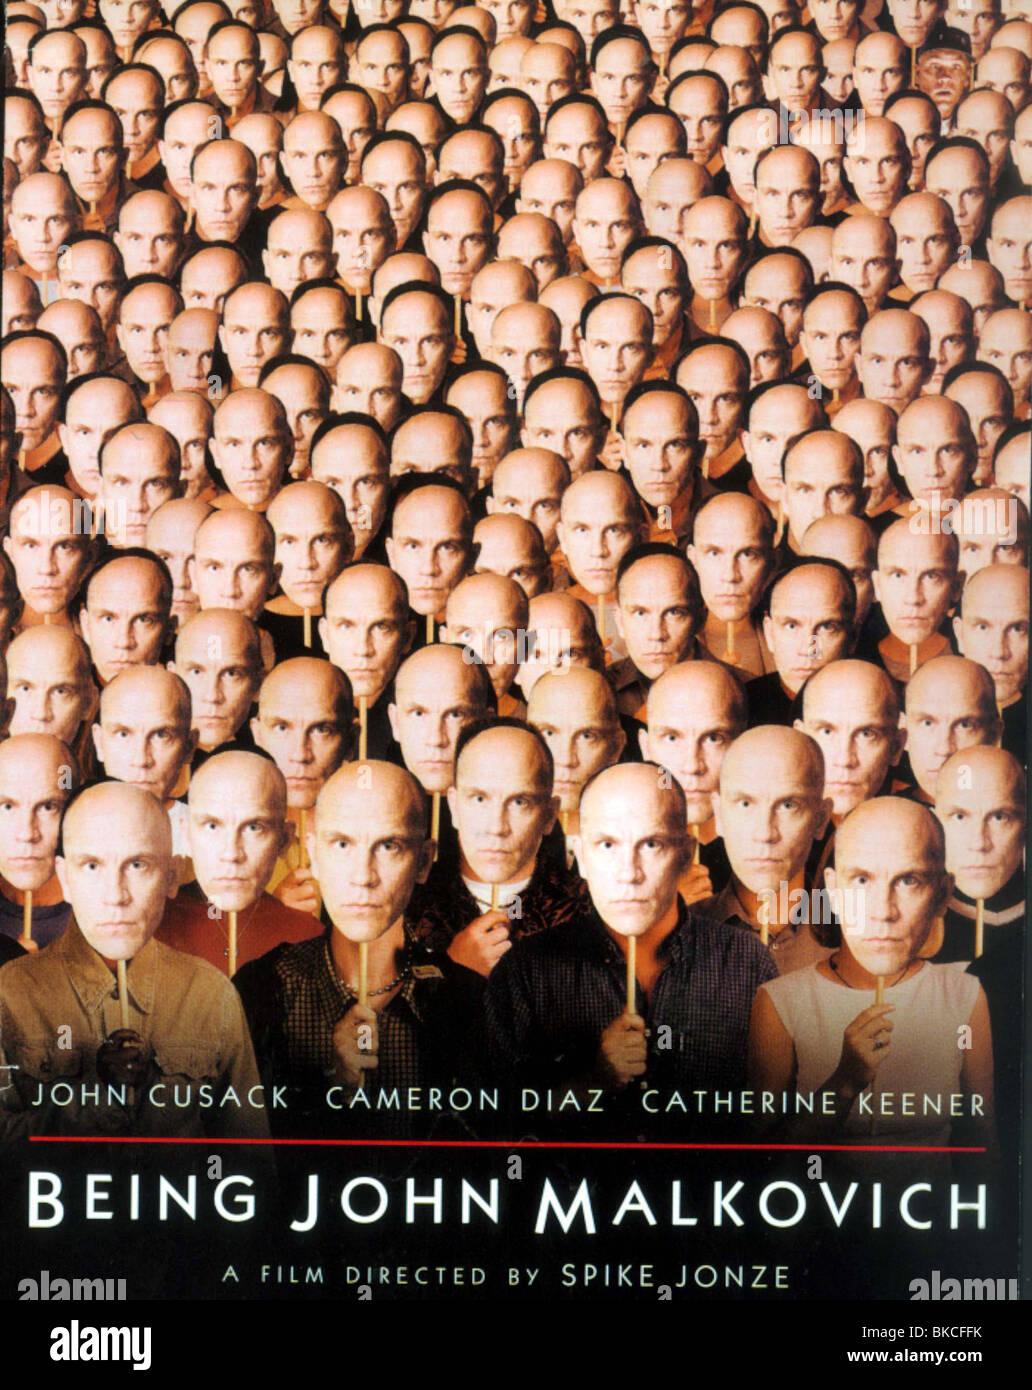 BEING JOHN MALKOVICH (1999) POSTER BJMK 001VS - Stock Image